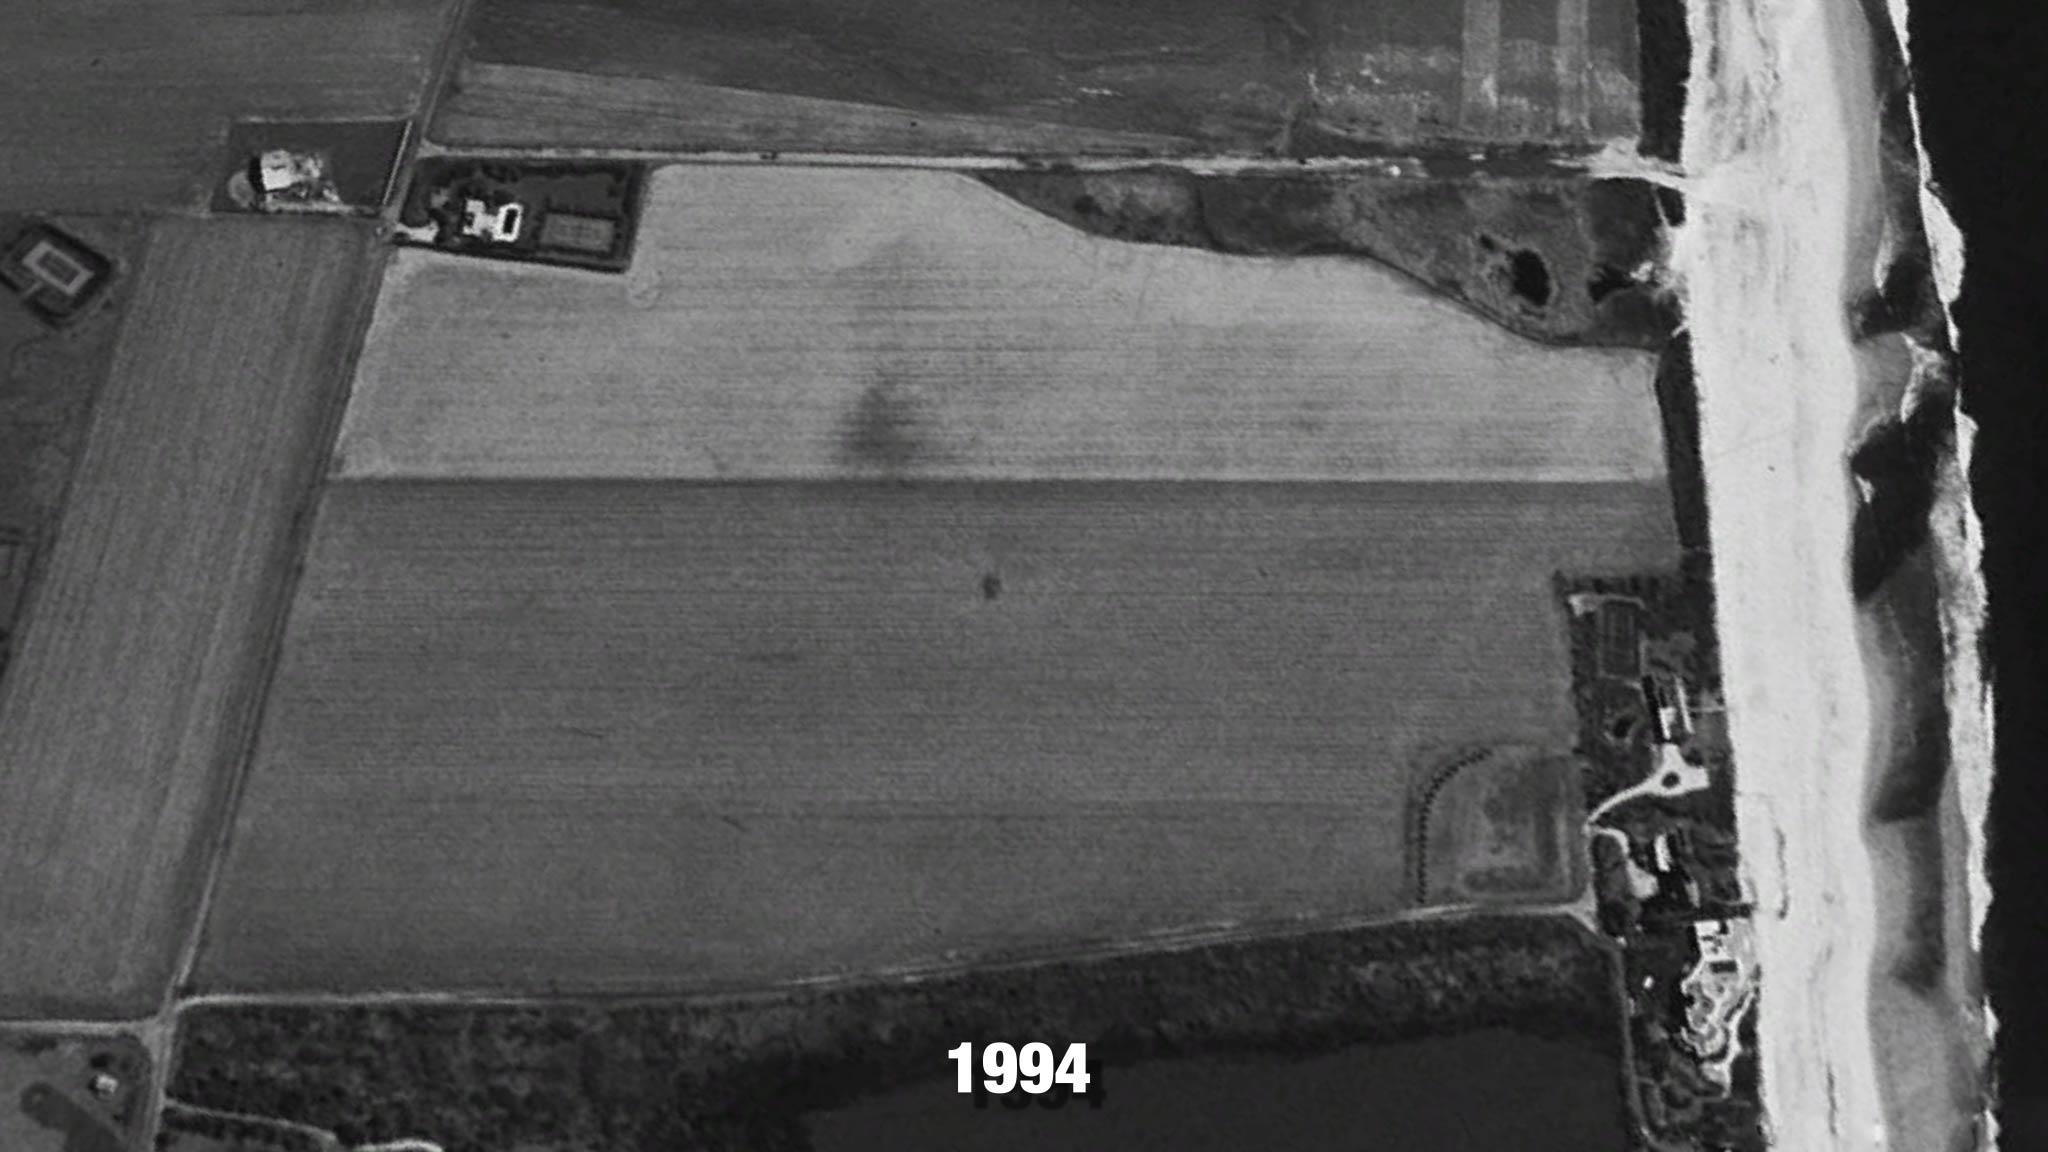 C_OBH_Hamptons_Satellite_2k_Static_Rennert_Before_Year.jpg